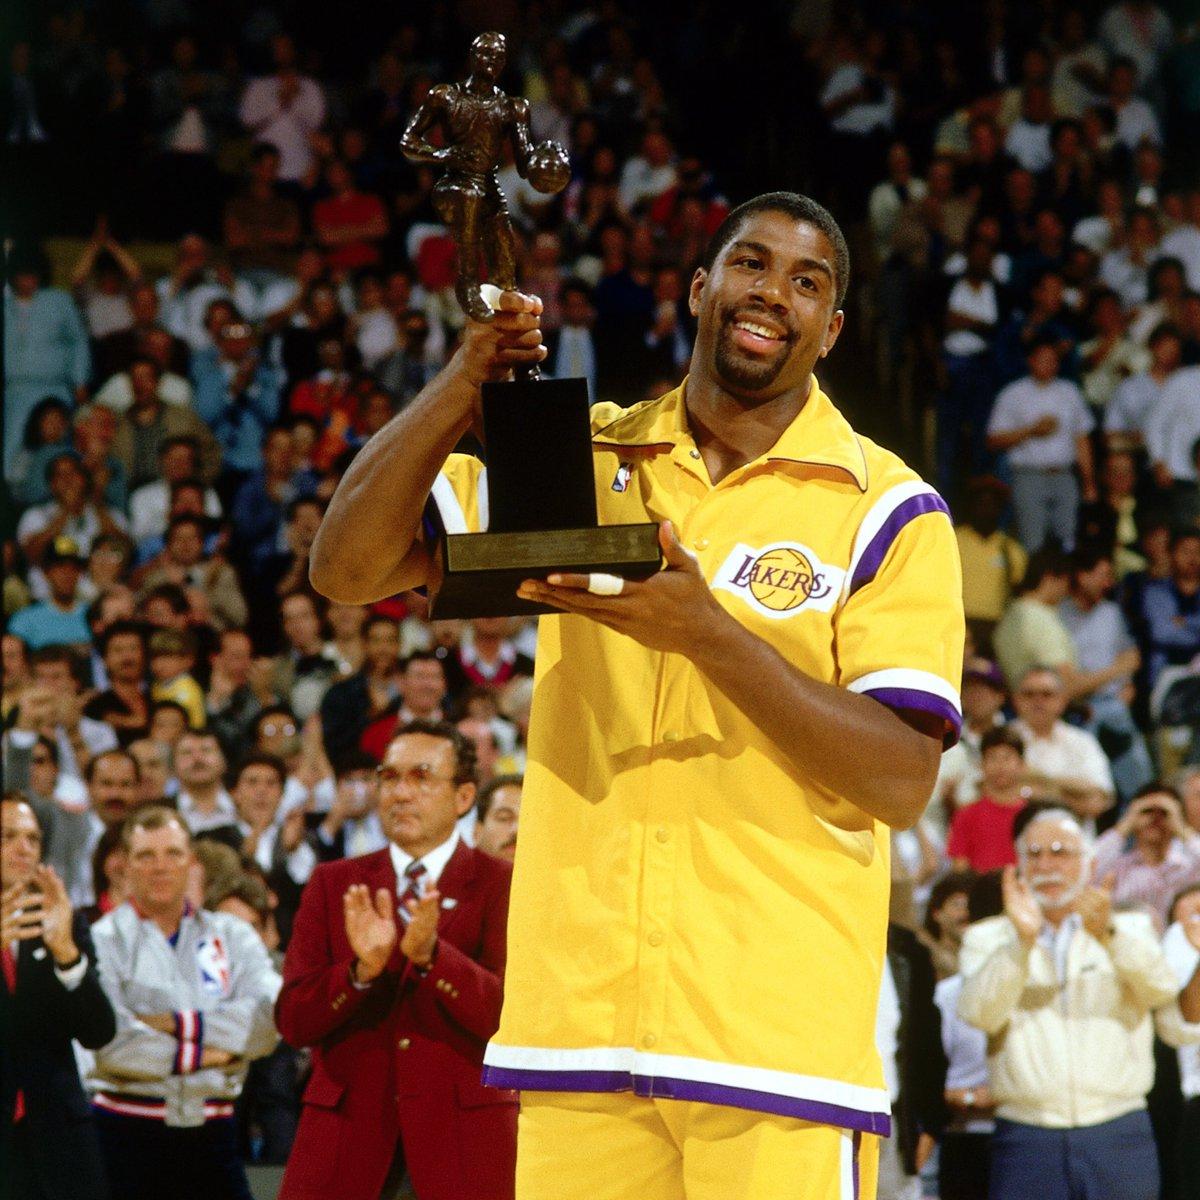 5x NBA champ. 3x MVP. HBD to the legend, @MagicJohnson 🙏🏽